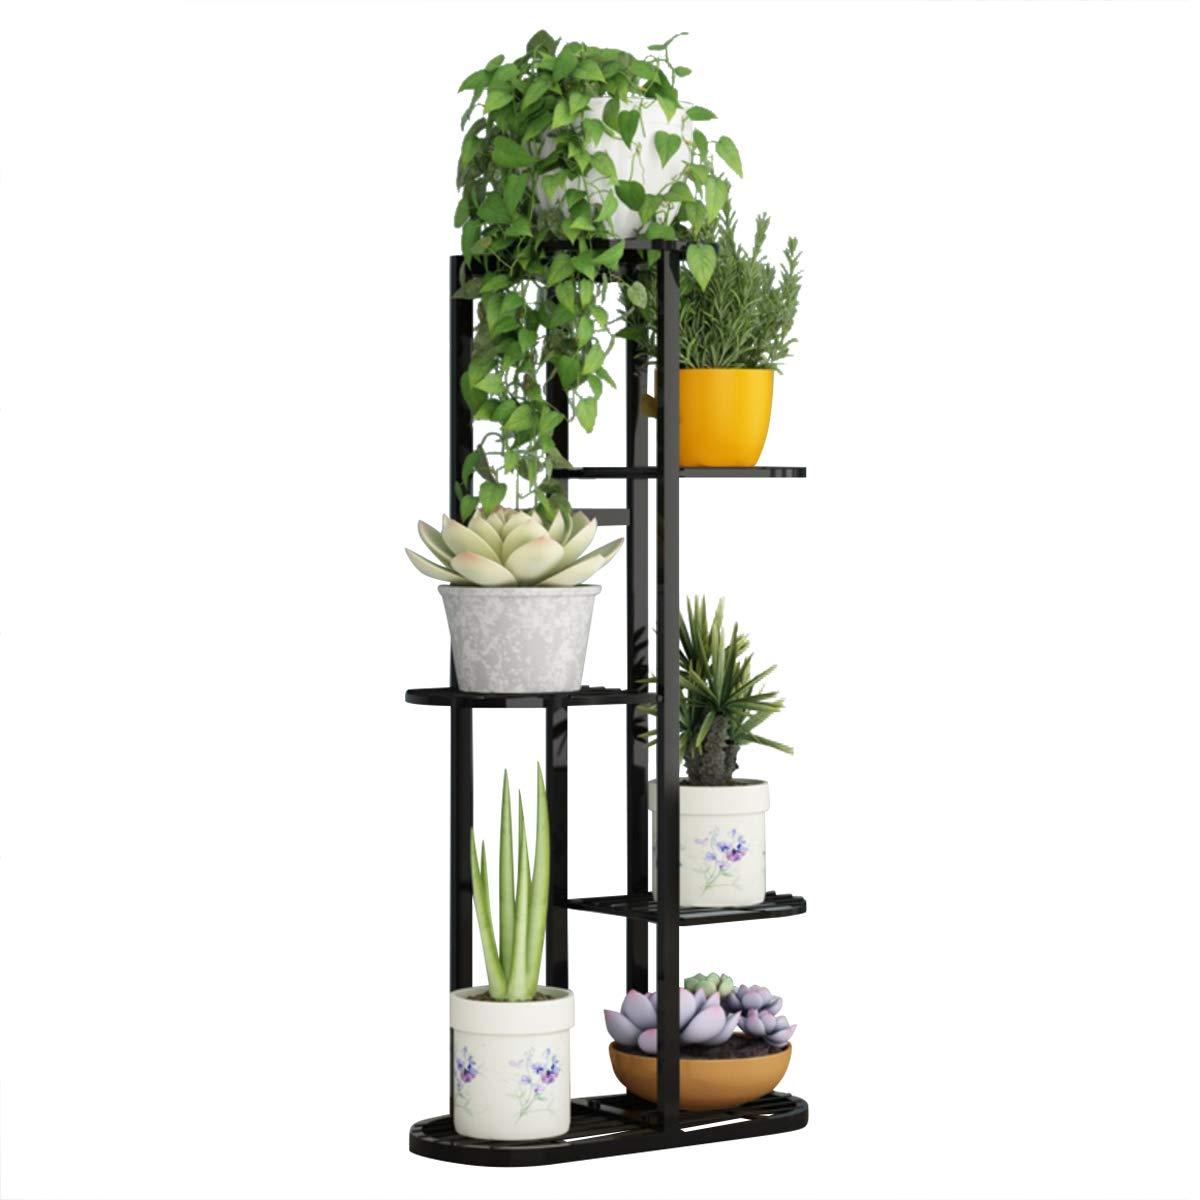 Indoor Planter Display Stand Rack 5 Tier Metal Plant Stand Flower Pots Holder (Black)